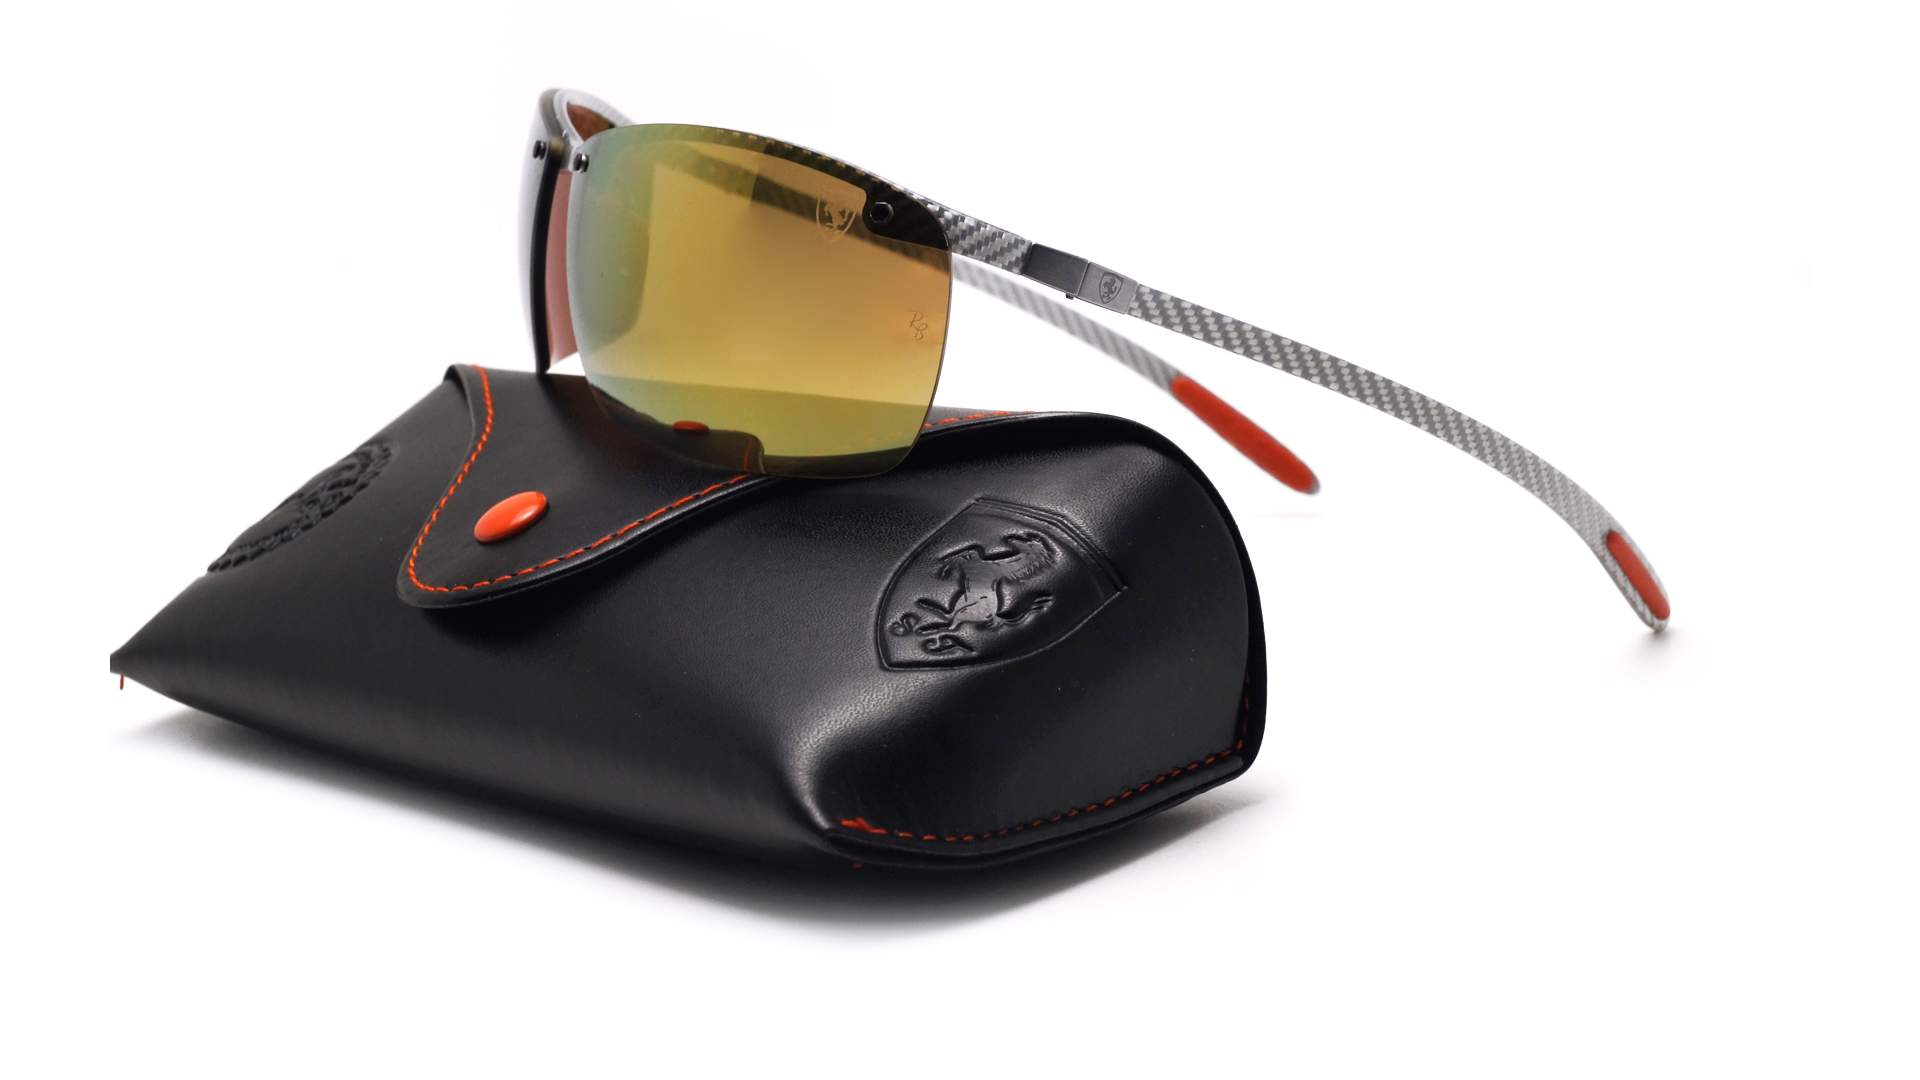 c5420fef978d1 Sunglasses Ray-Ban Fibre Carbon Scuderia Ferrari Grey Chromance RB8305M  F006 6B 65-14 Large Polarized Mirror